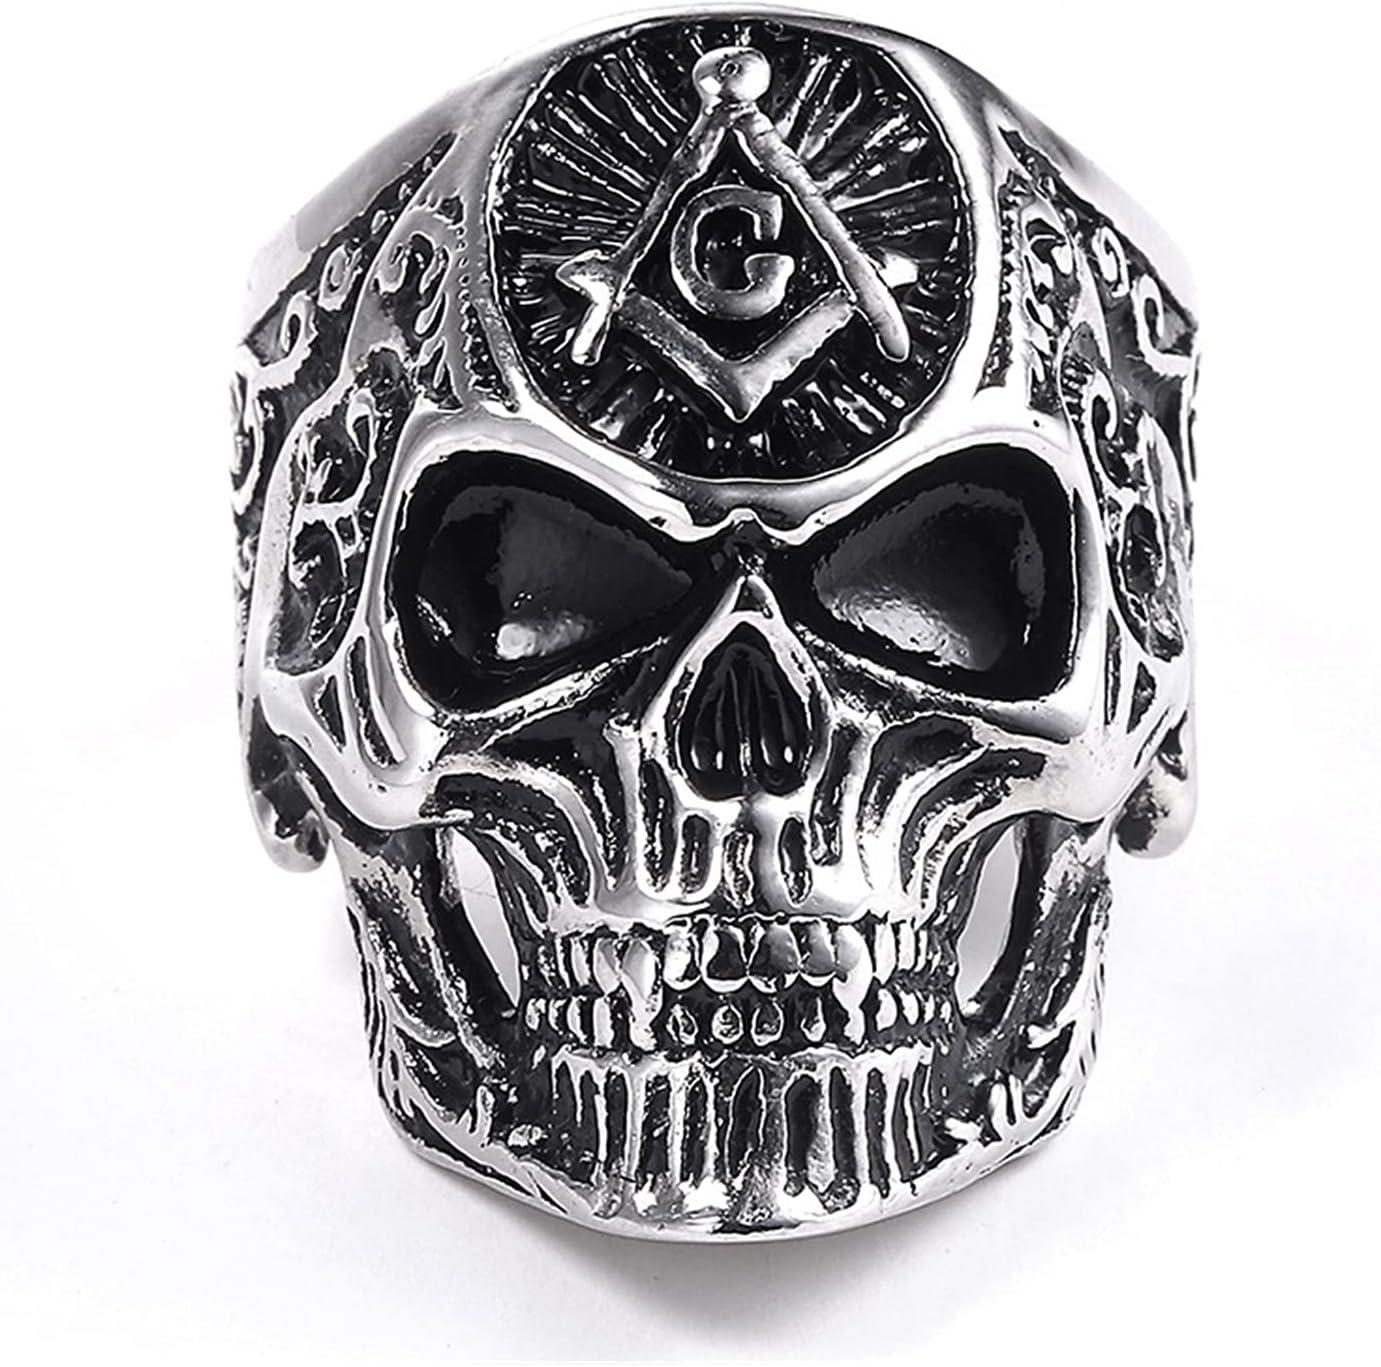 JIAH Ring Unique Punk Gothic Satanic Manufacturer direct delivery M Skull Ram Demon Austin Mall Head